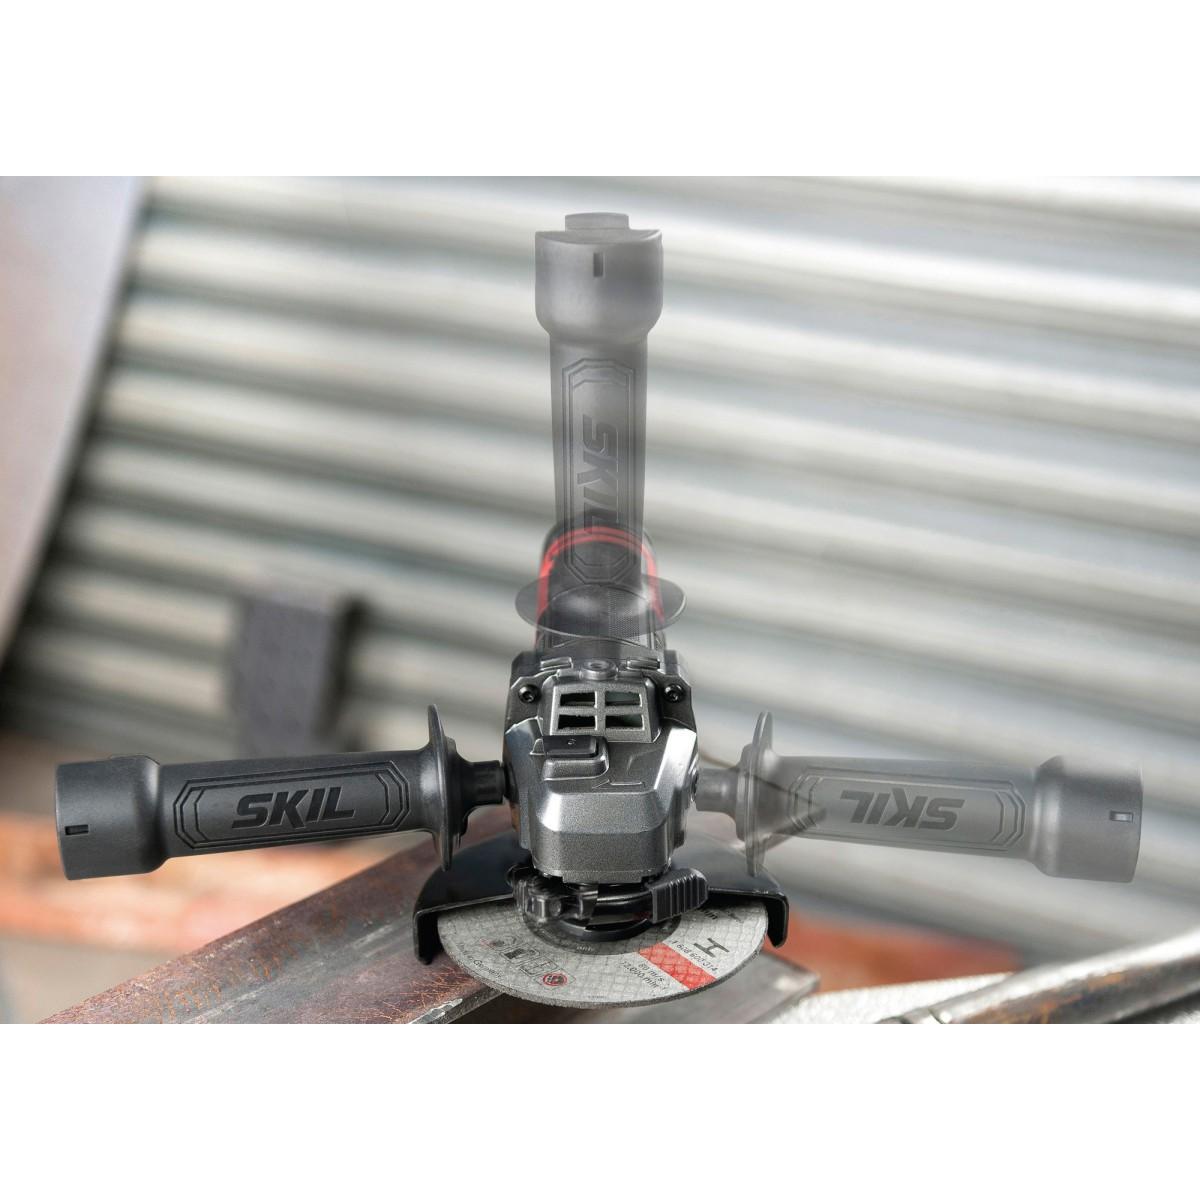 Meuleuse d'angle 9130 AA Skil - 720 W - Diamètre 115 mm